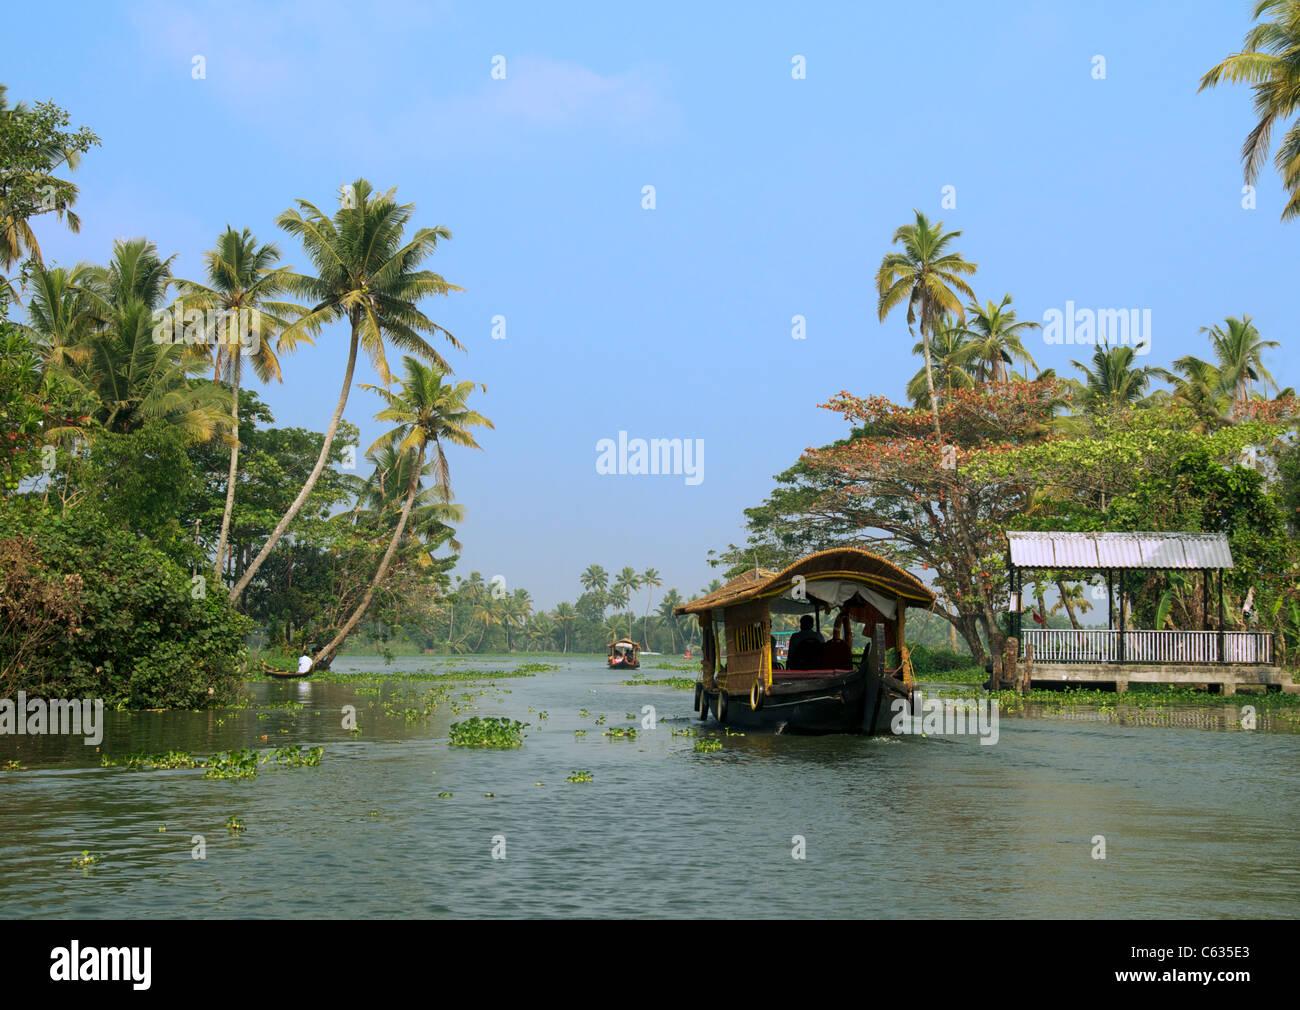 Houseboat lasciando Alappuzha Backwaters Kerala India del Sud Immagini Stock